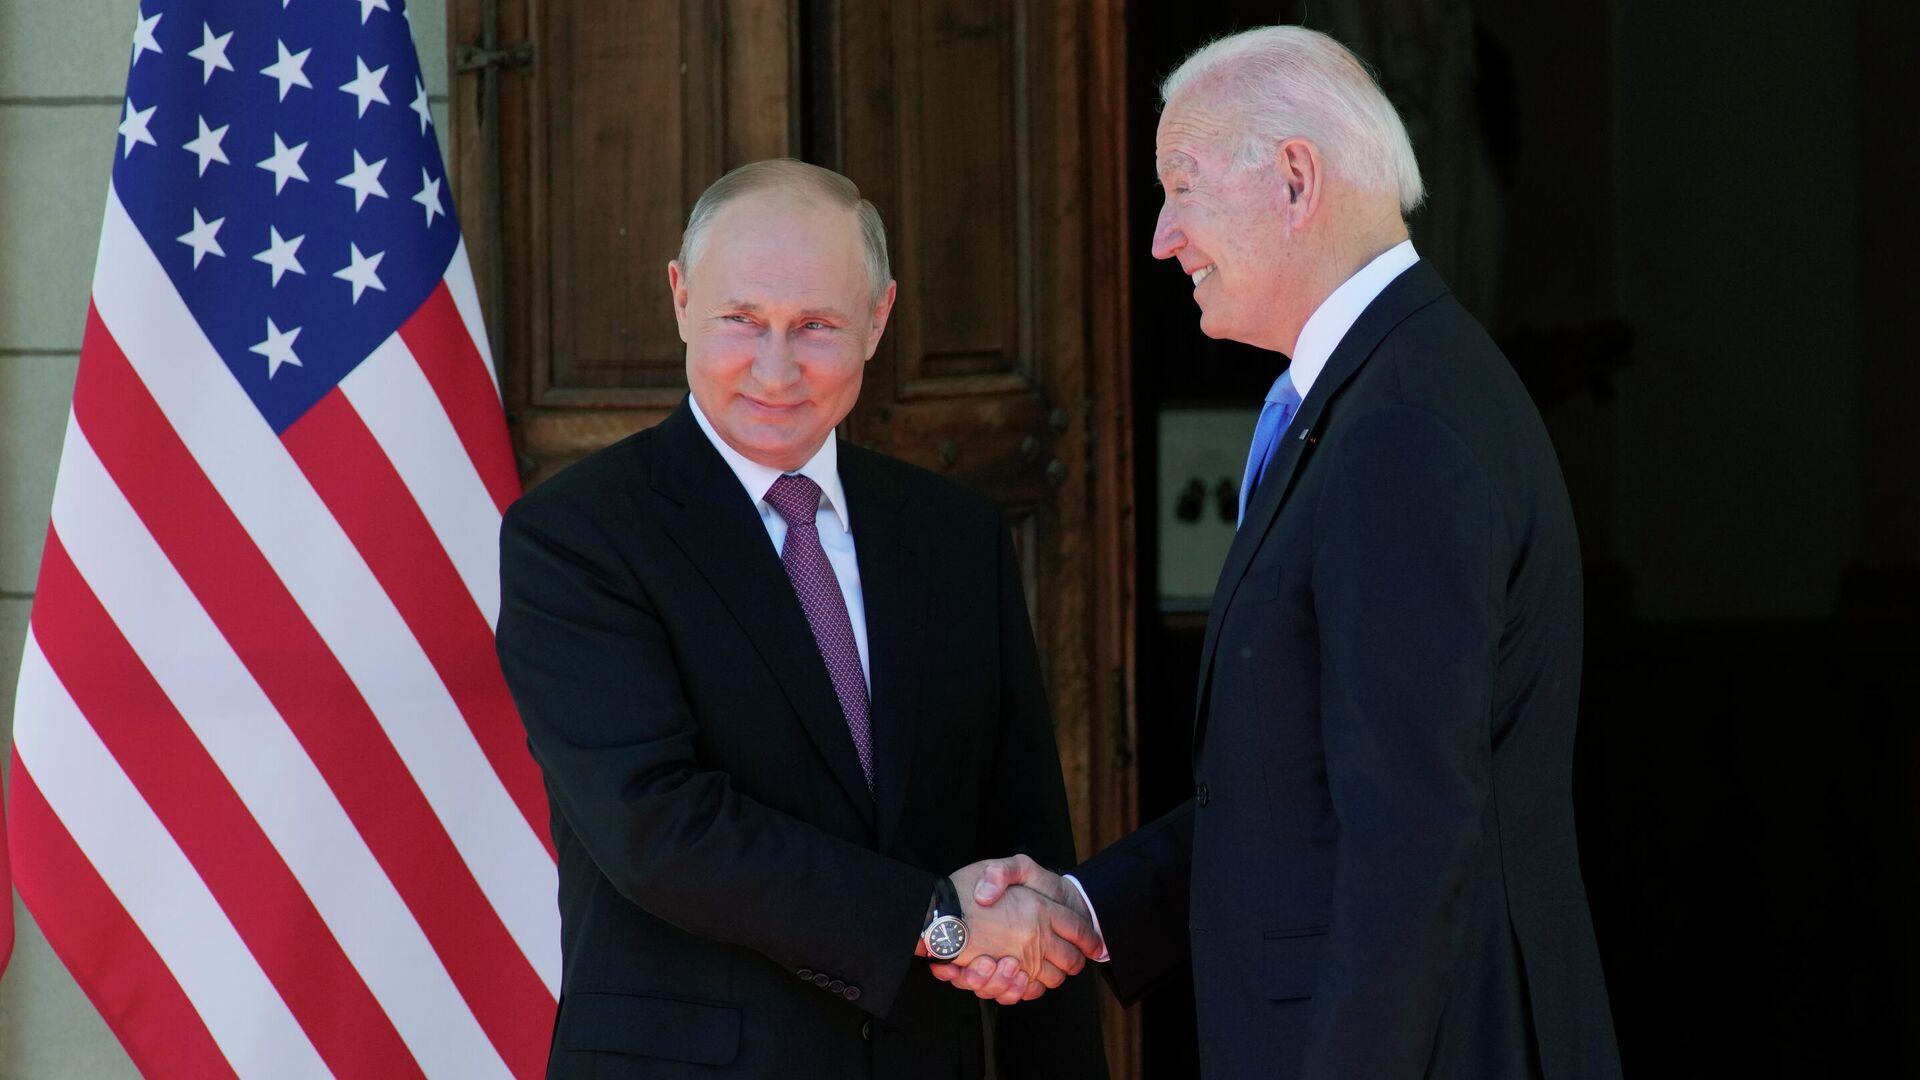 Президент РФ Владимир Путин и президент США Джо Байден во время встречи на вилле Ла Гранж в Женеве - РИА Новости, 1920, 13.10.2021